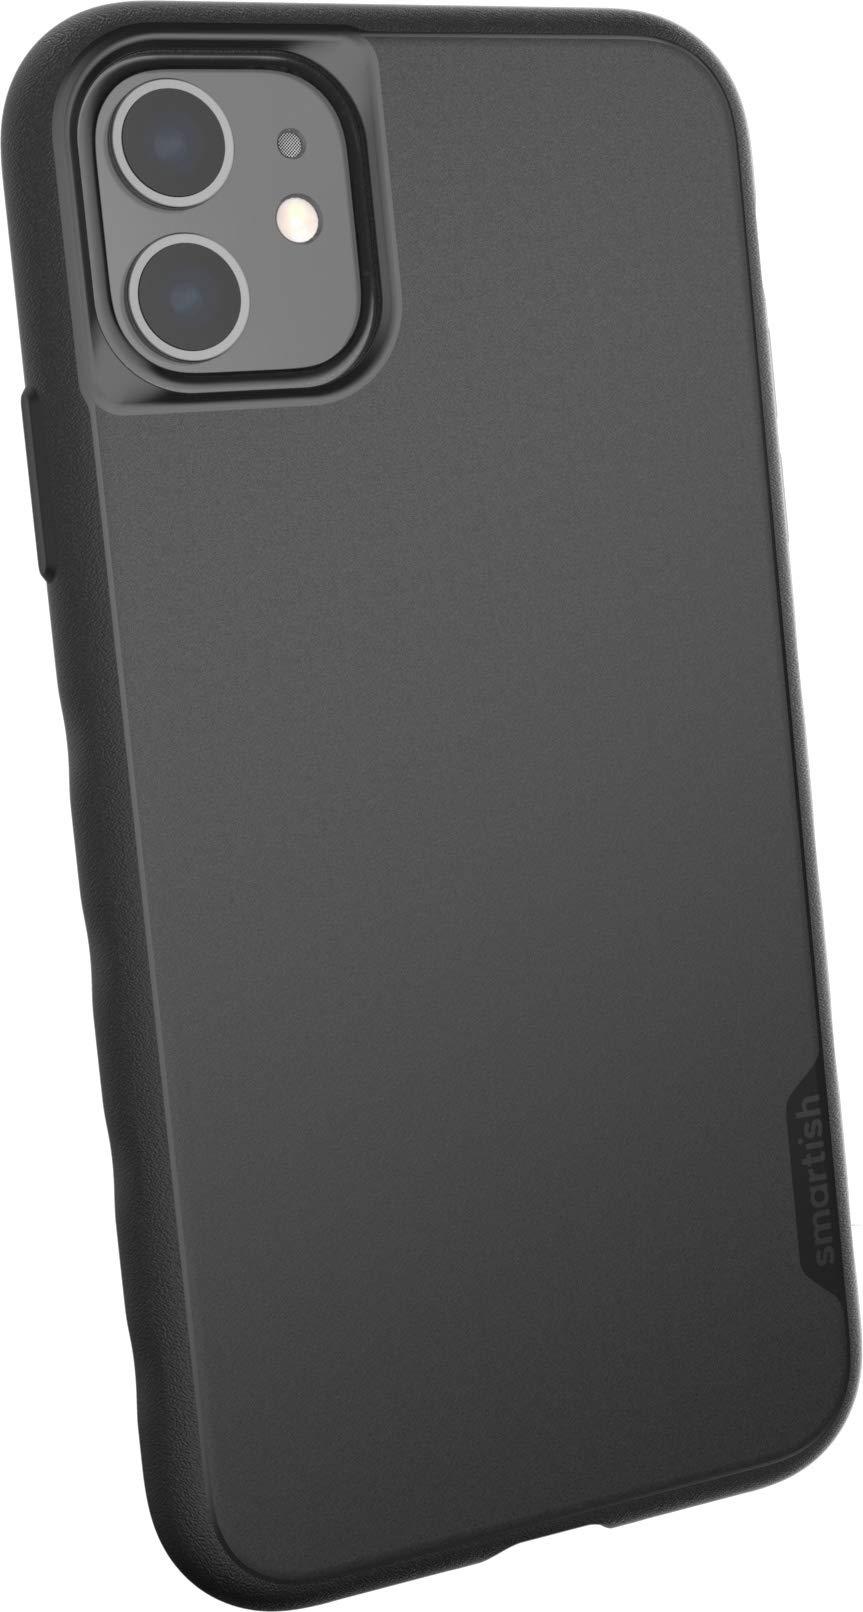 Funda para Iphone 11 (6.1) SMARTISH [7T5Y7KRR]